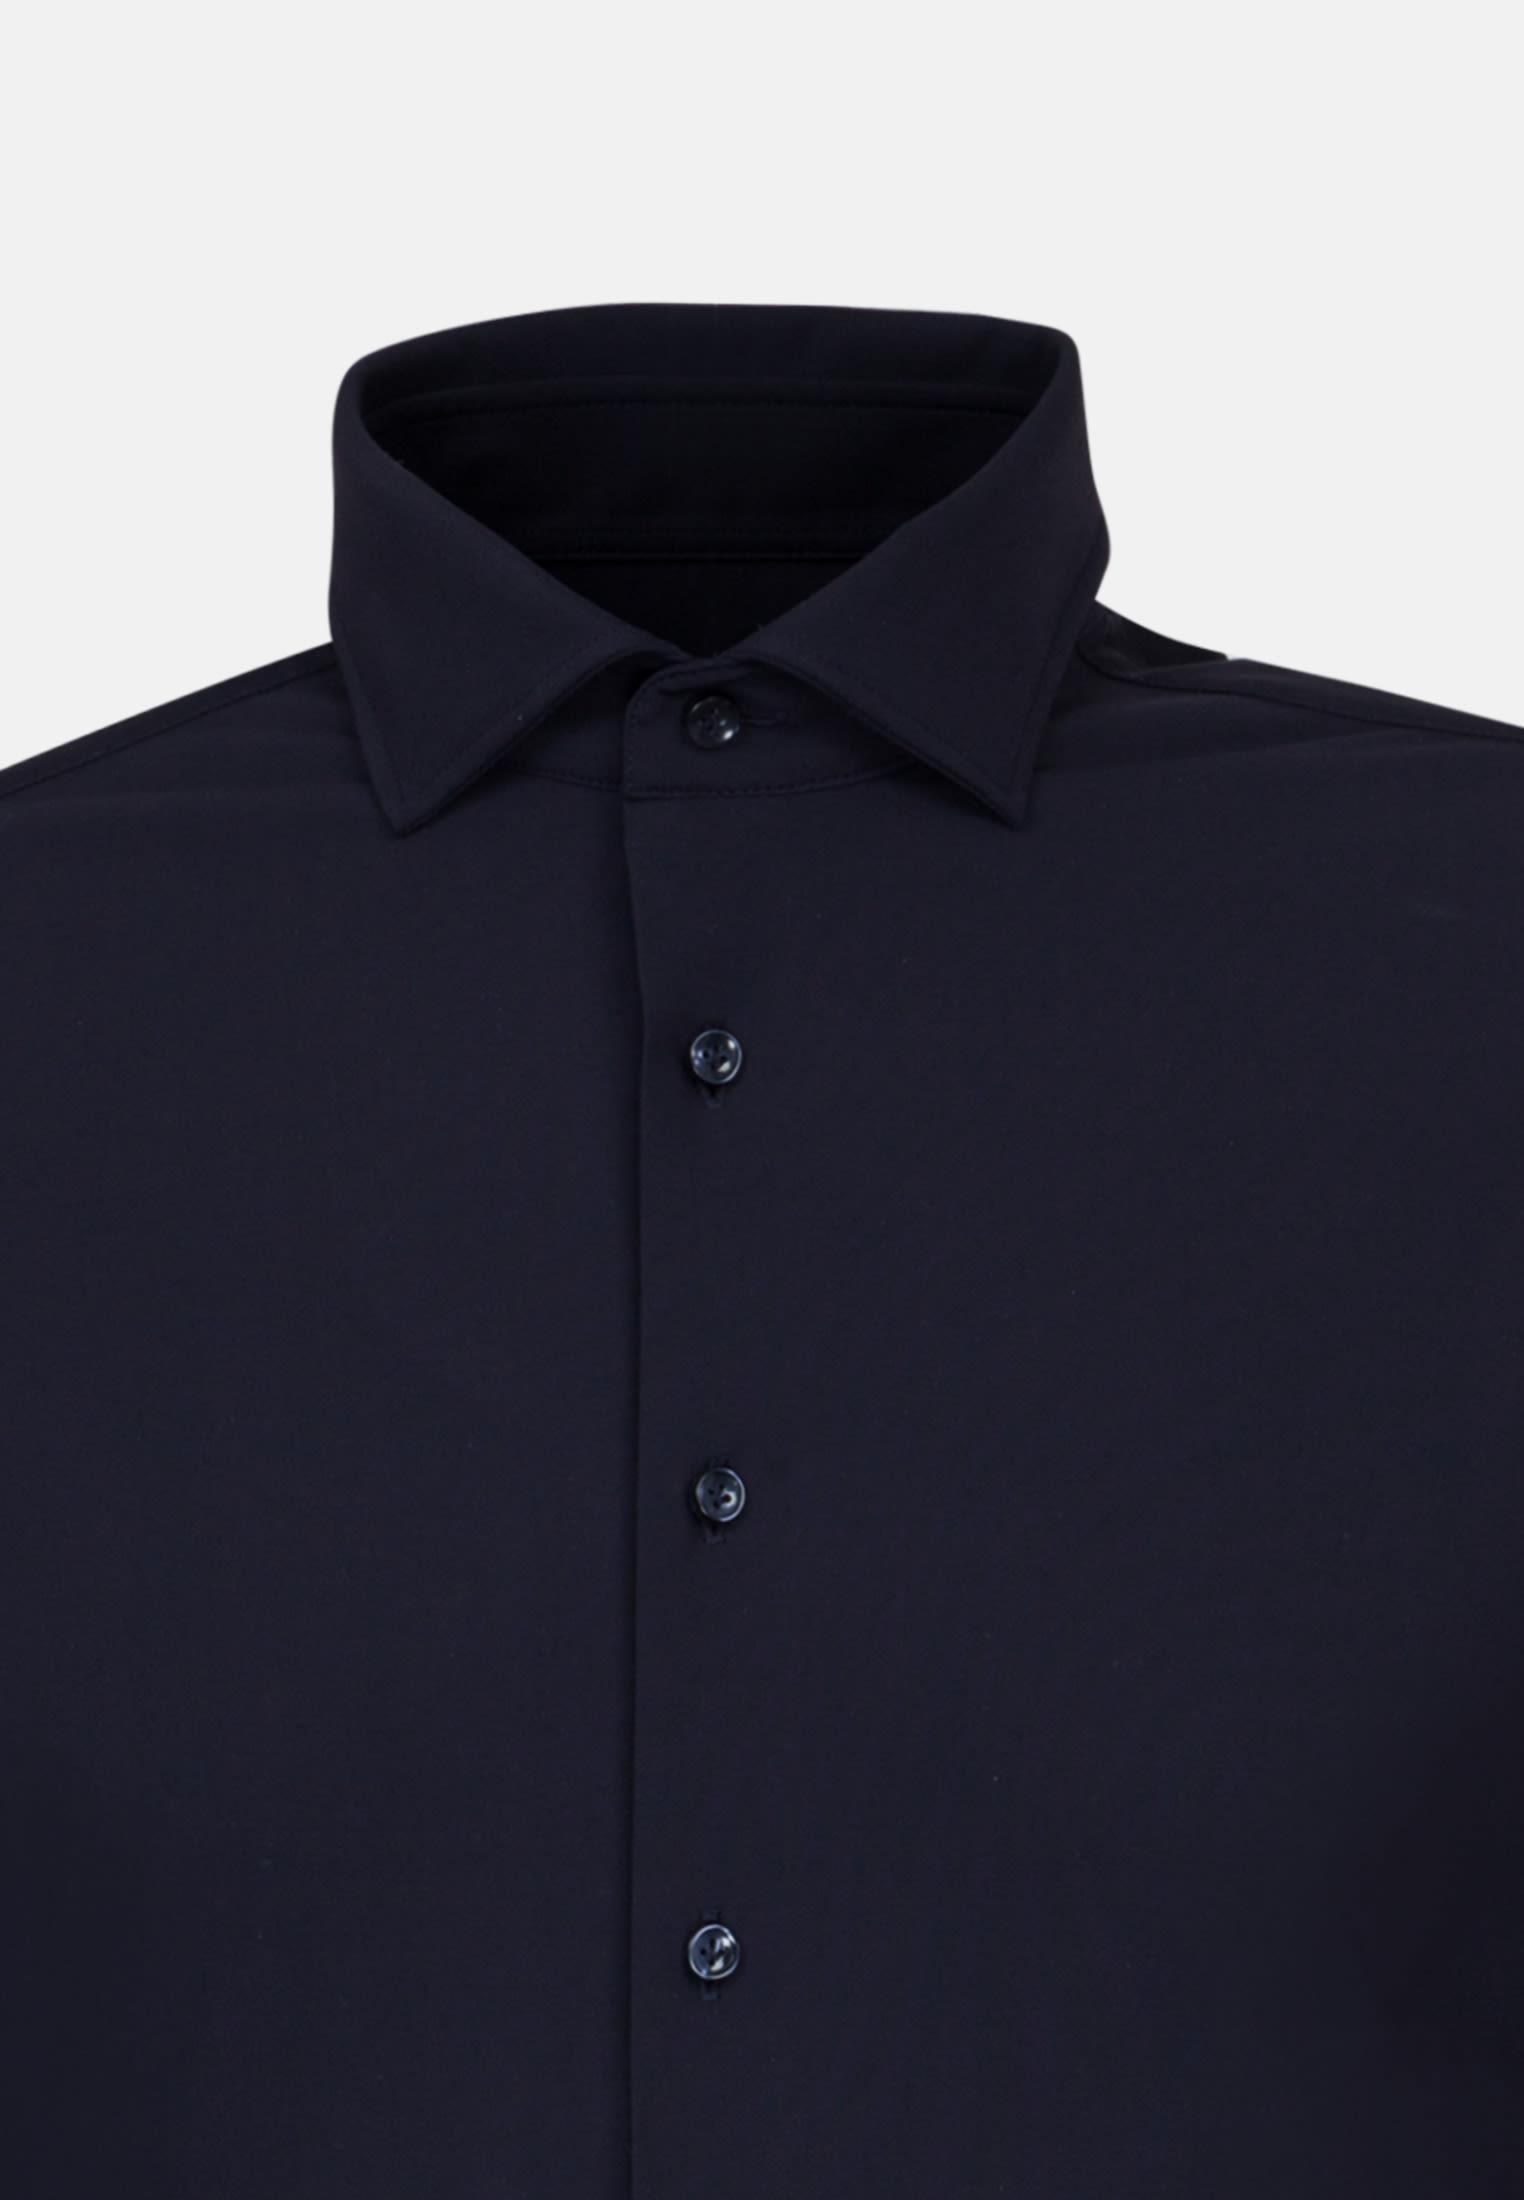 Jersey Smart Casual Hemd in Perfect Fit mit Haifischkragen in Dunkelblau |  Jacques Britt Onlineshop